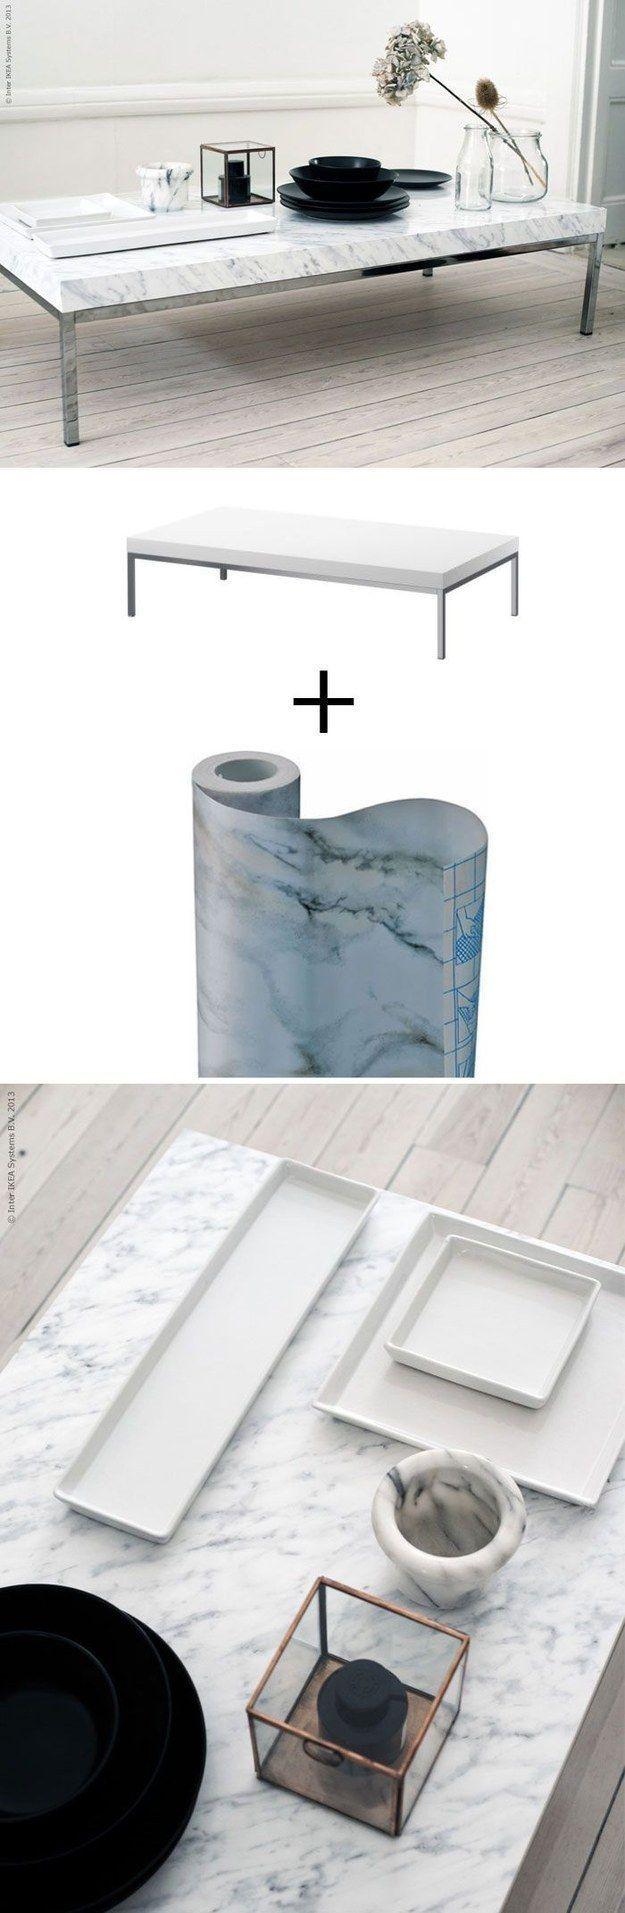 #diy #ledeclicanticlope / Table basse  illusion marbre - Via Peggy on Buzzfeed